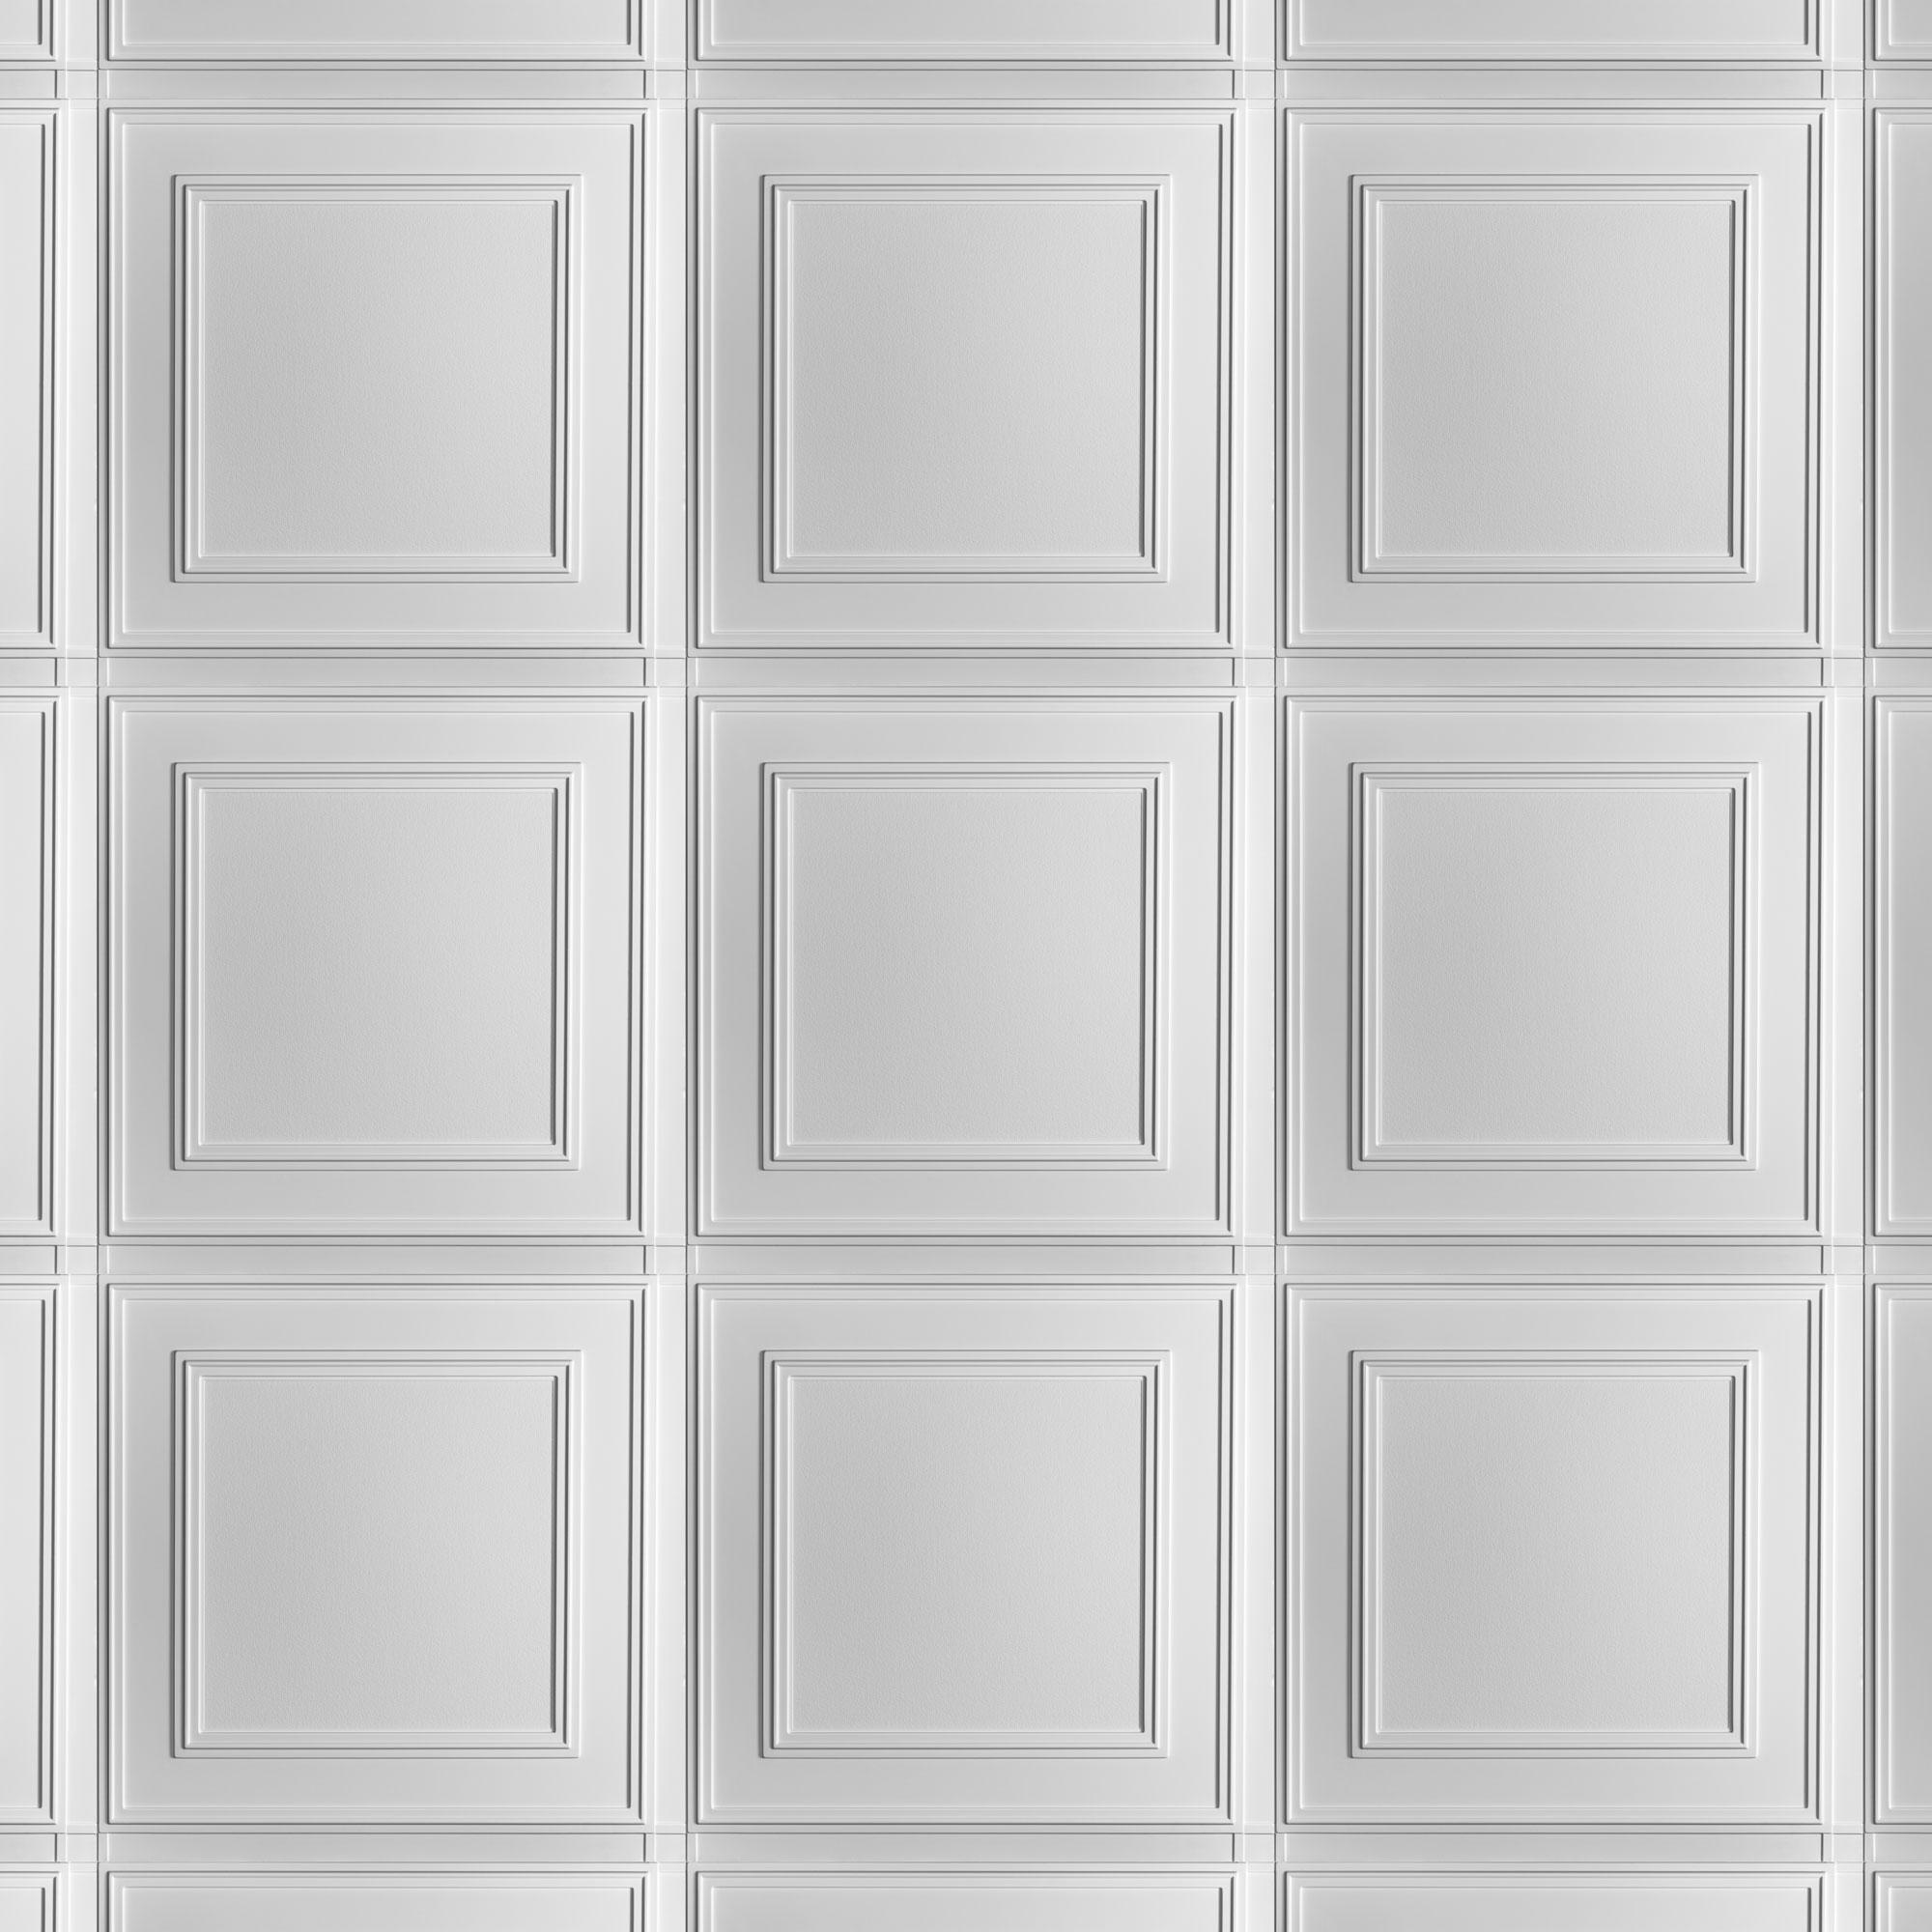 Manchester Ceiling Tiles